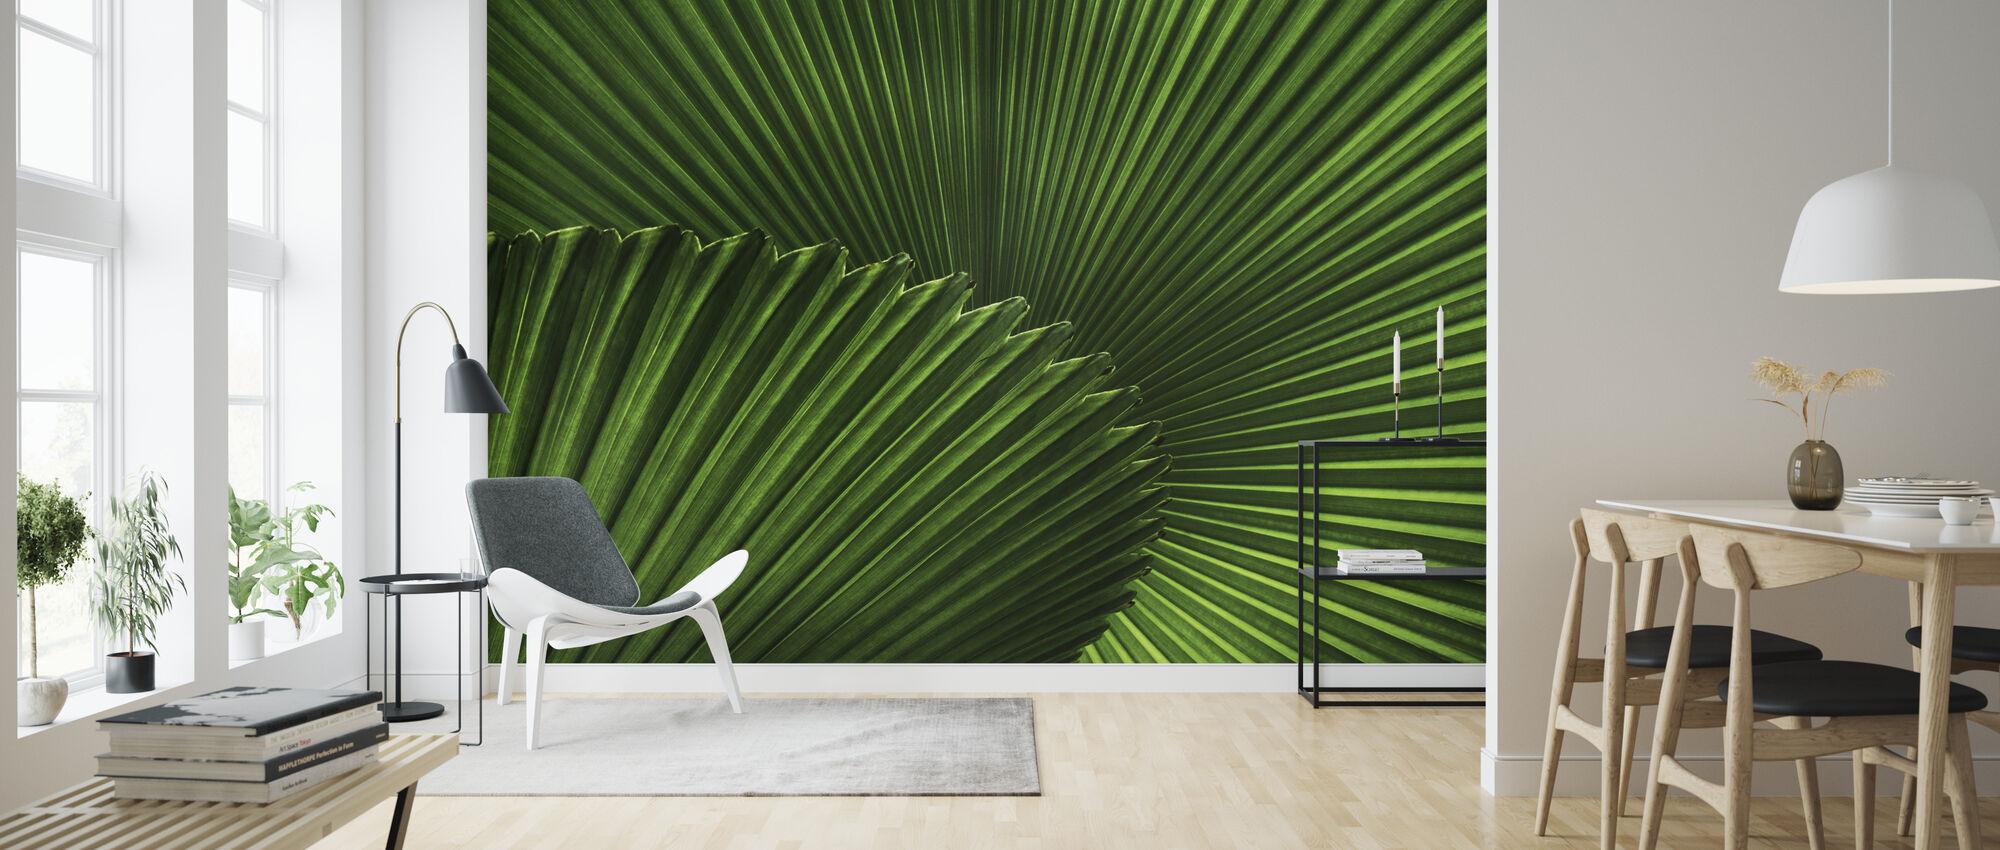 Vifter Palm blader - Tapet - Stue